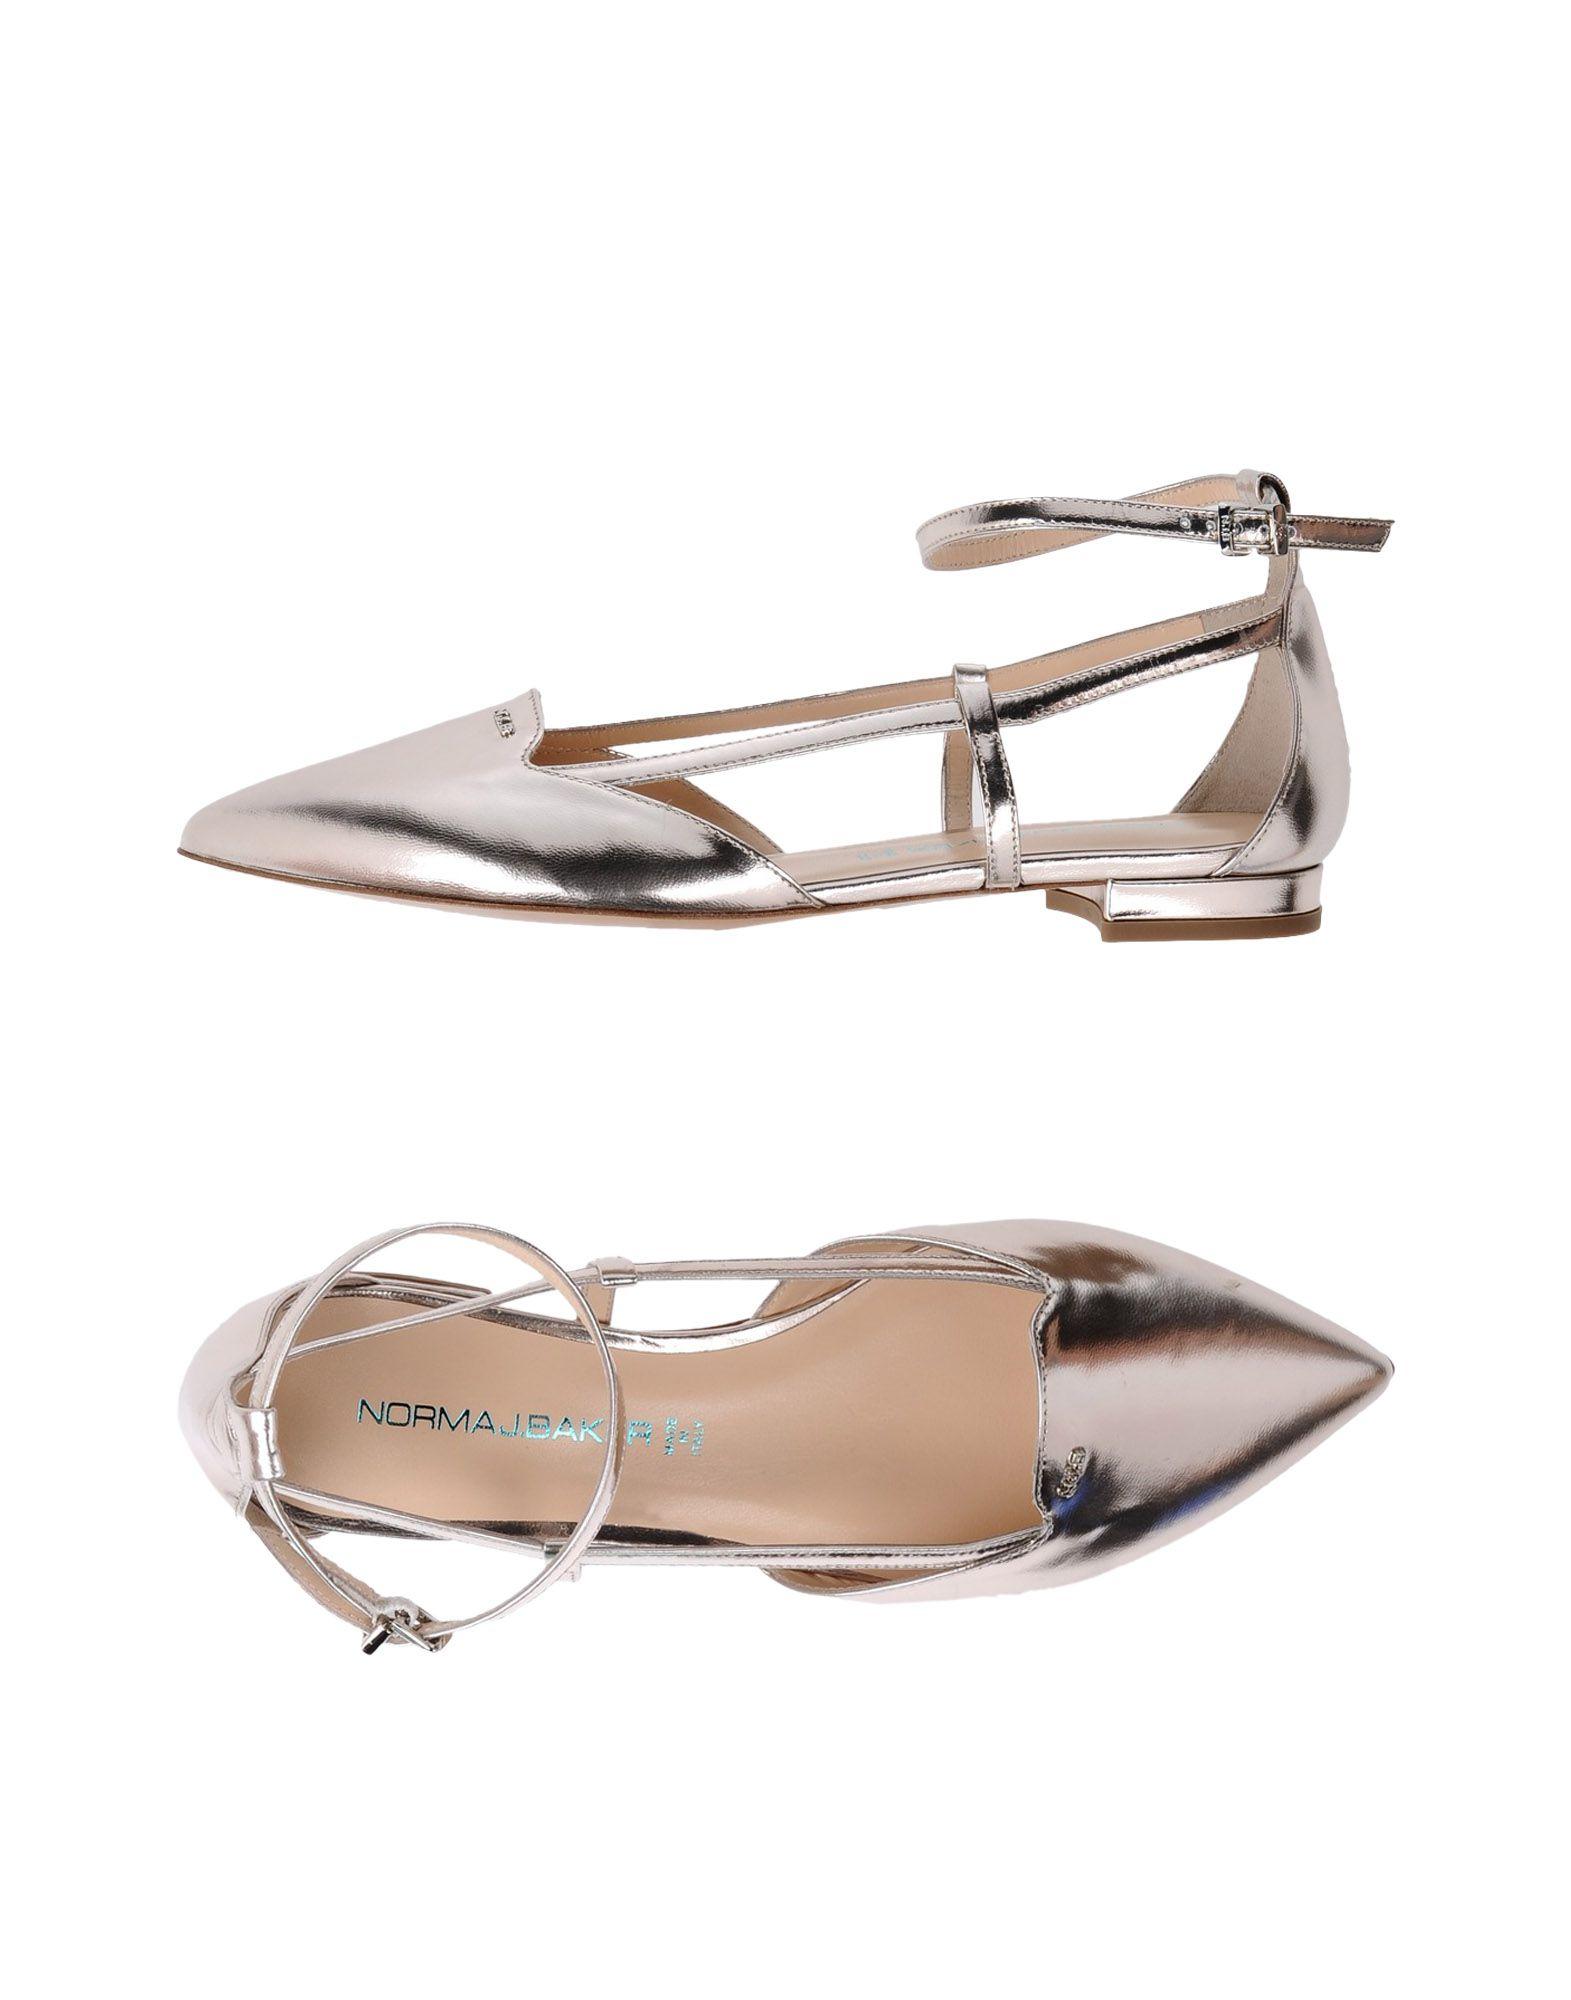 Norma J.Baker Ballerinas Damen  11338940FKGut aussehende strapazierfähige Schuhe